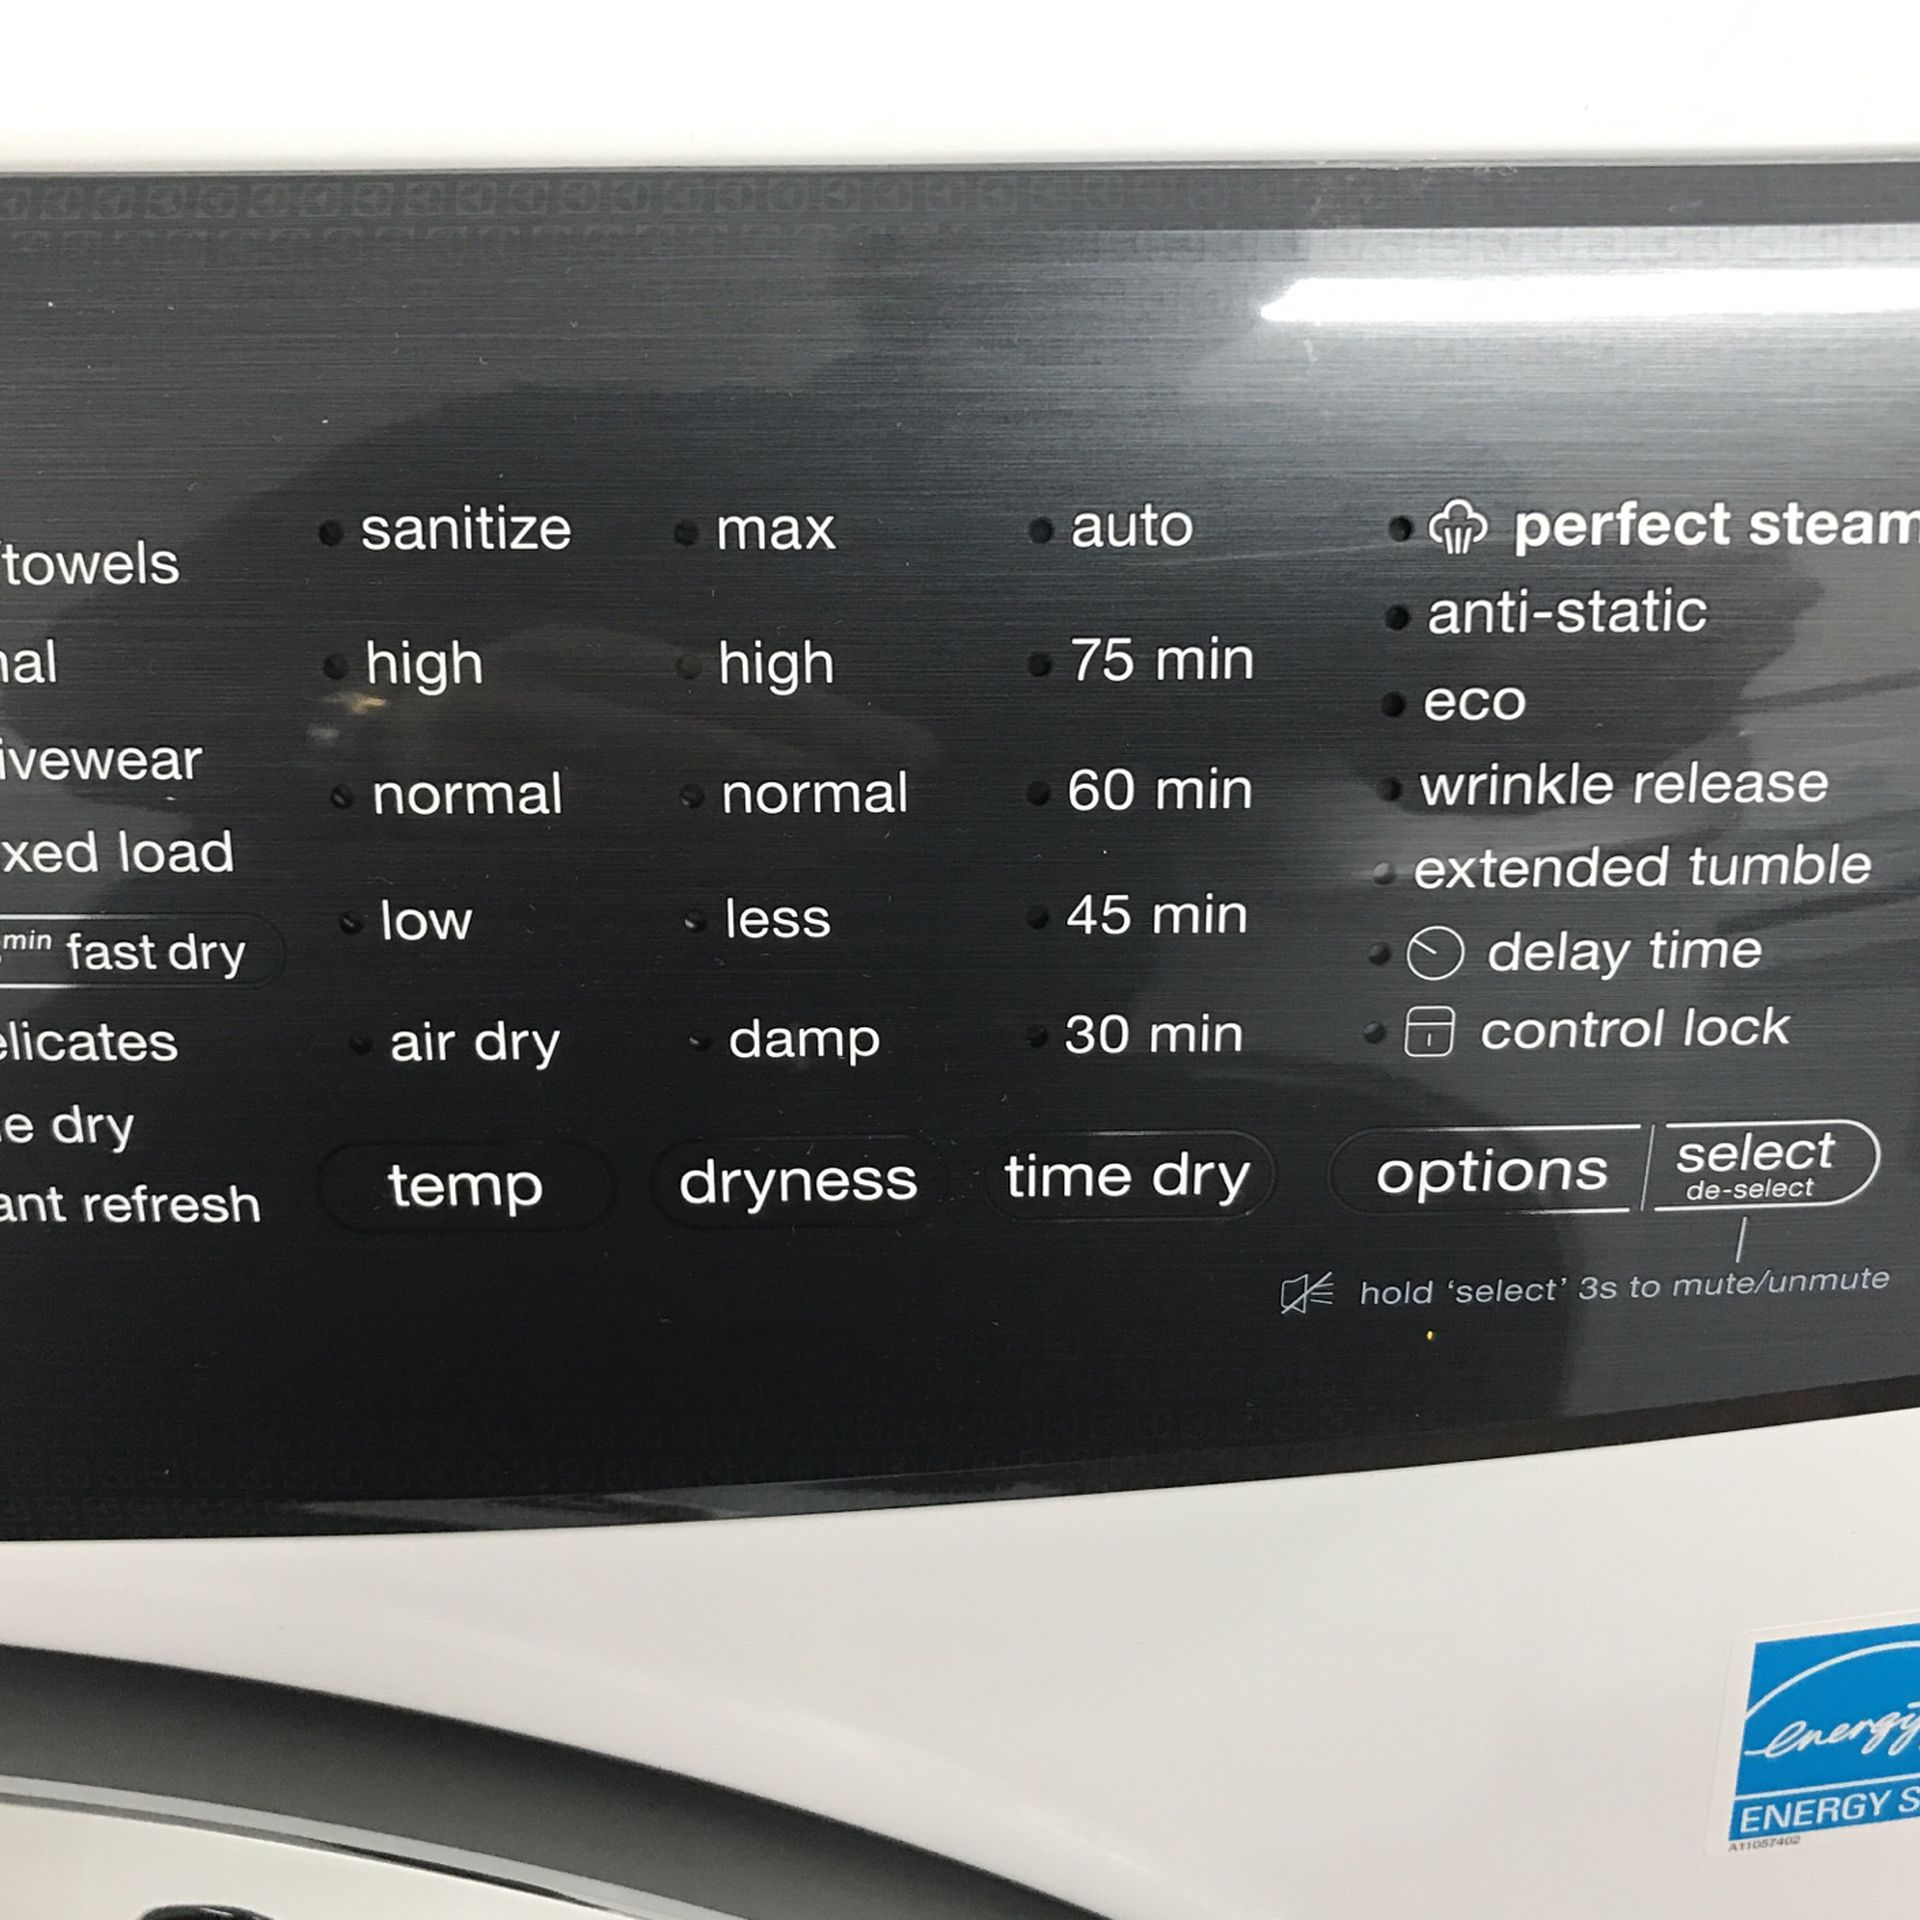 Electrolux Dryer In White Front Loader